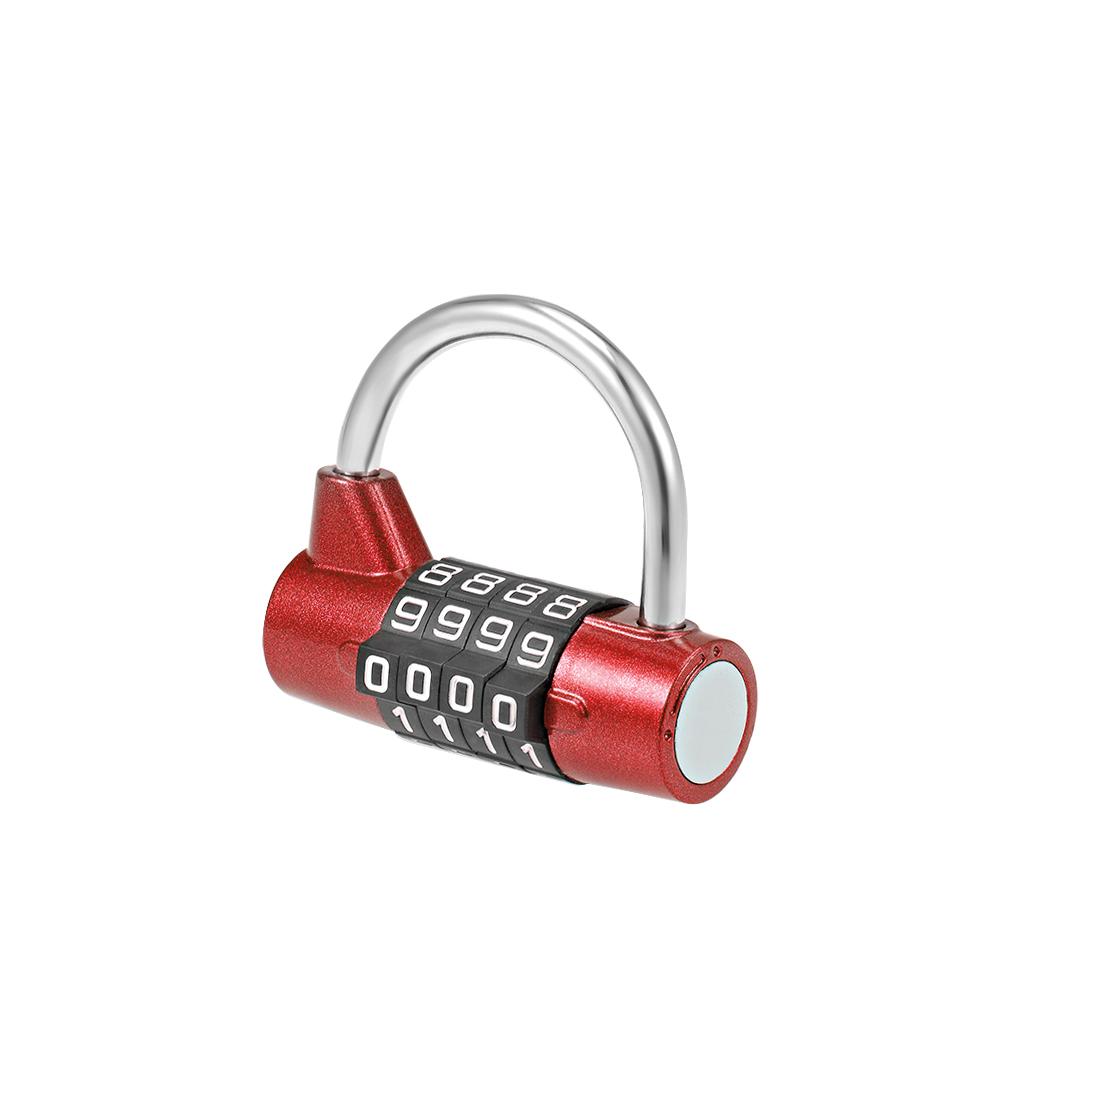 4-Digit Combination Padlock 2-inch Resettable Lock for Gate Locker Red